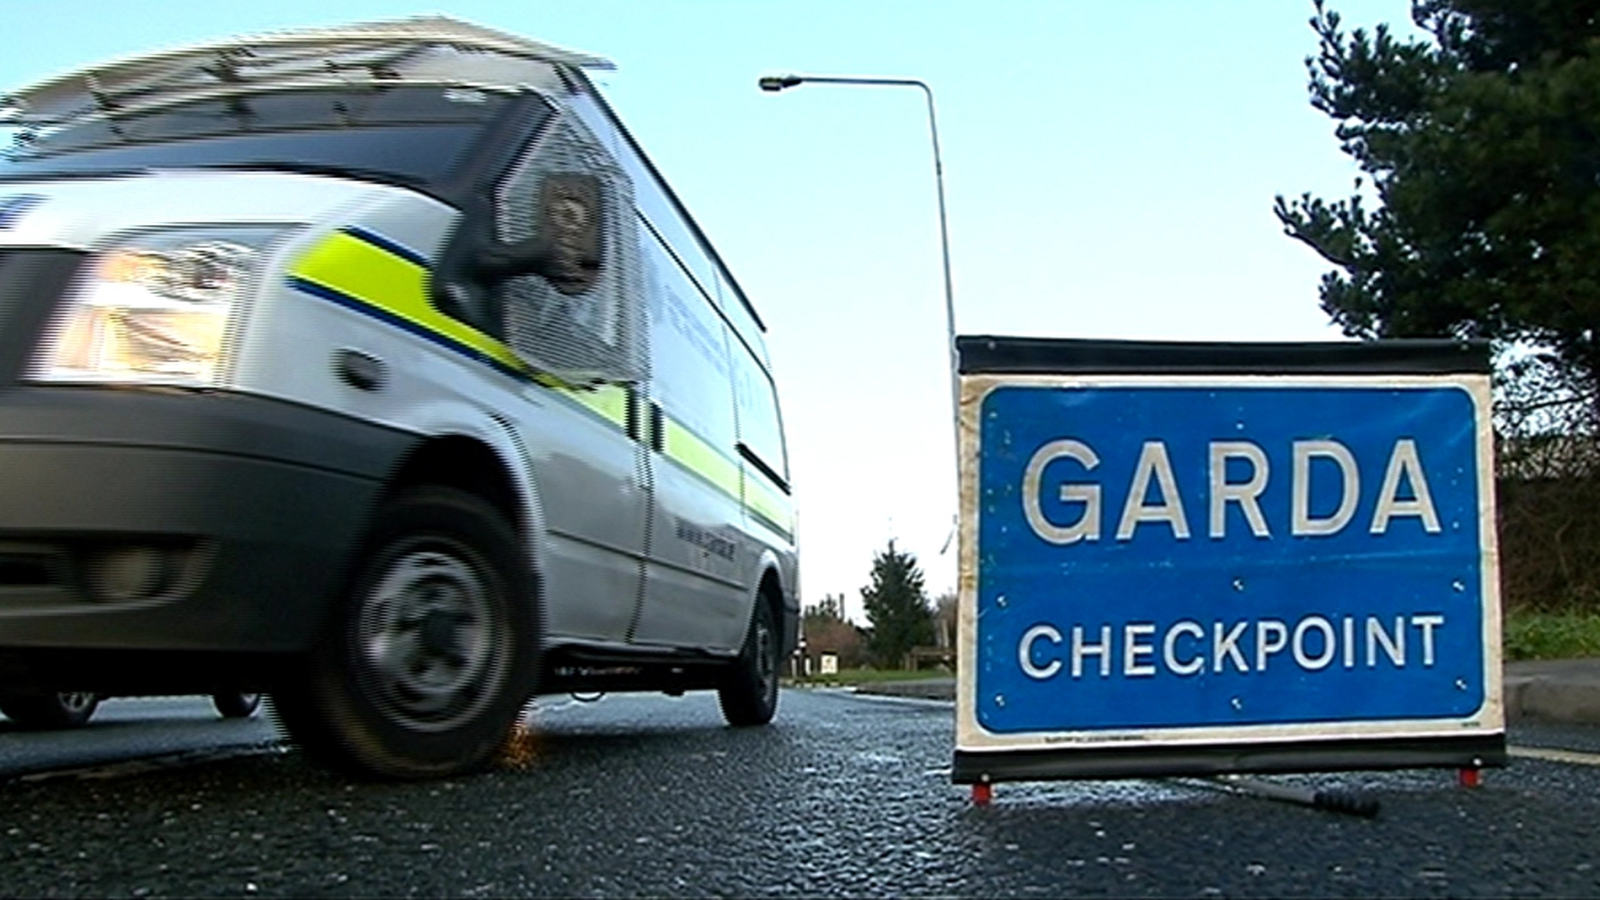 Taoiseach says Govt do not order garda checkpoints